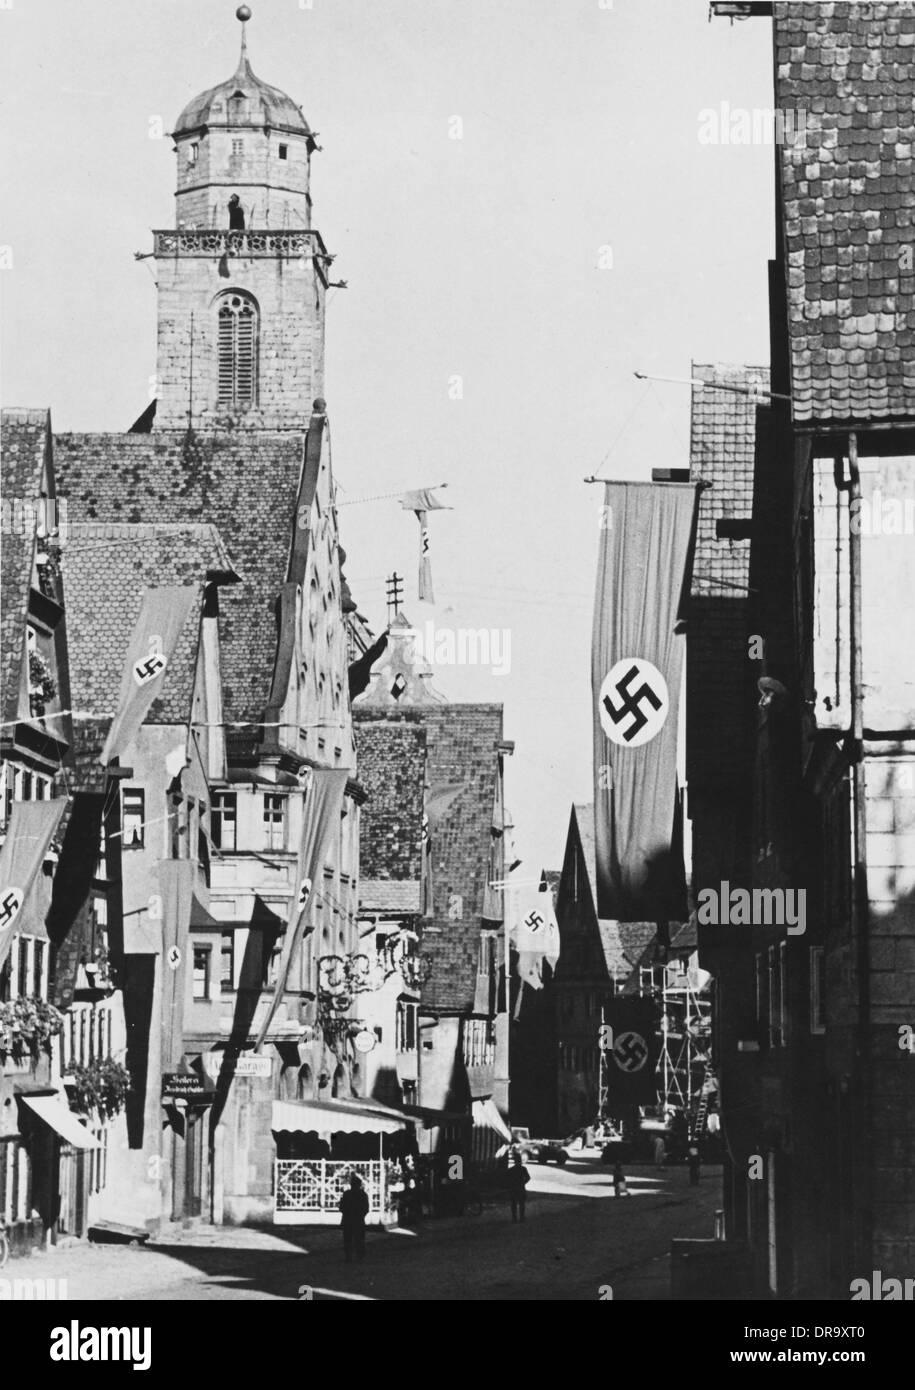 Nazi Flags - Stock Image